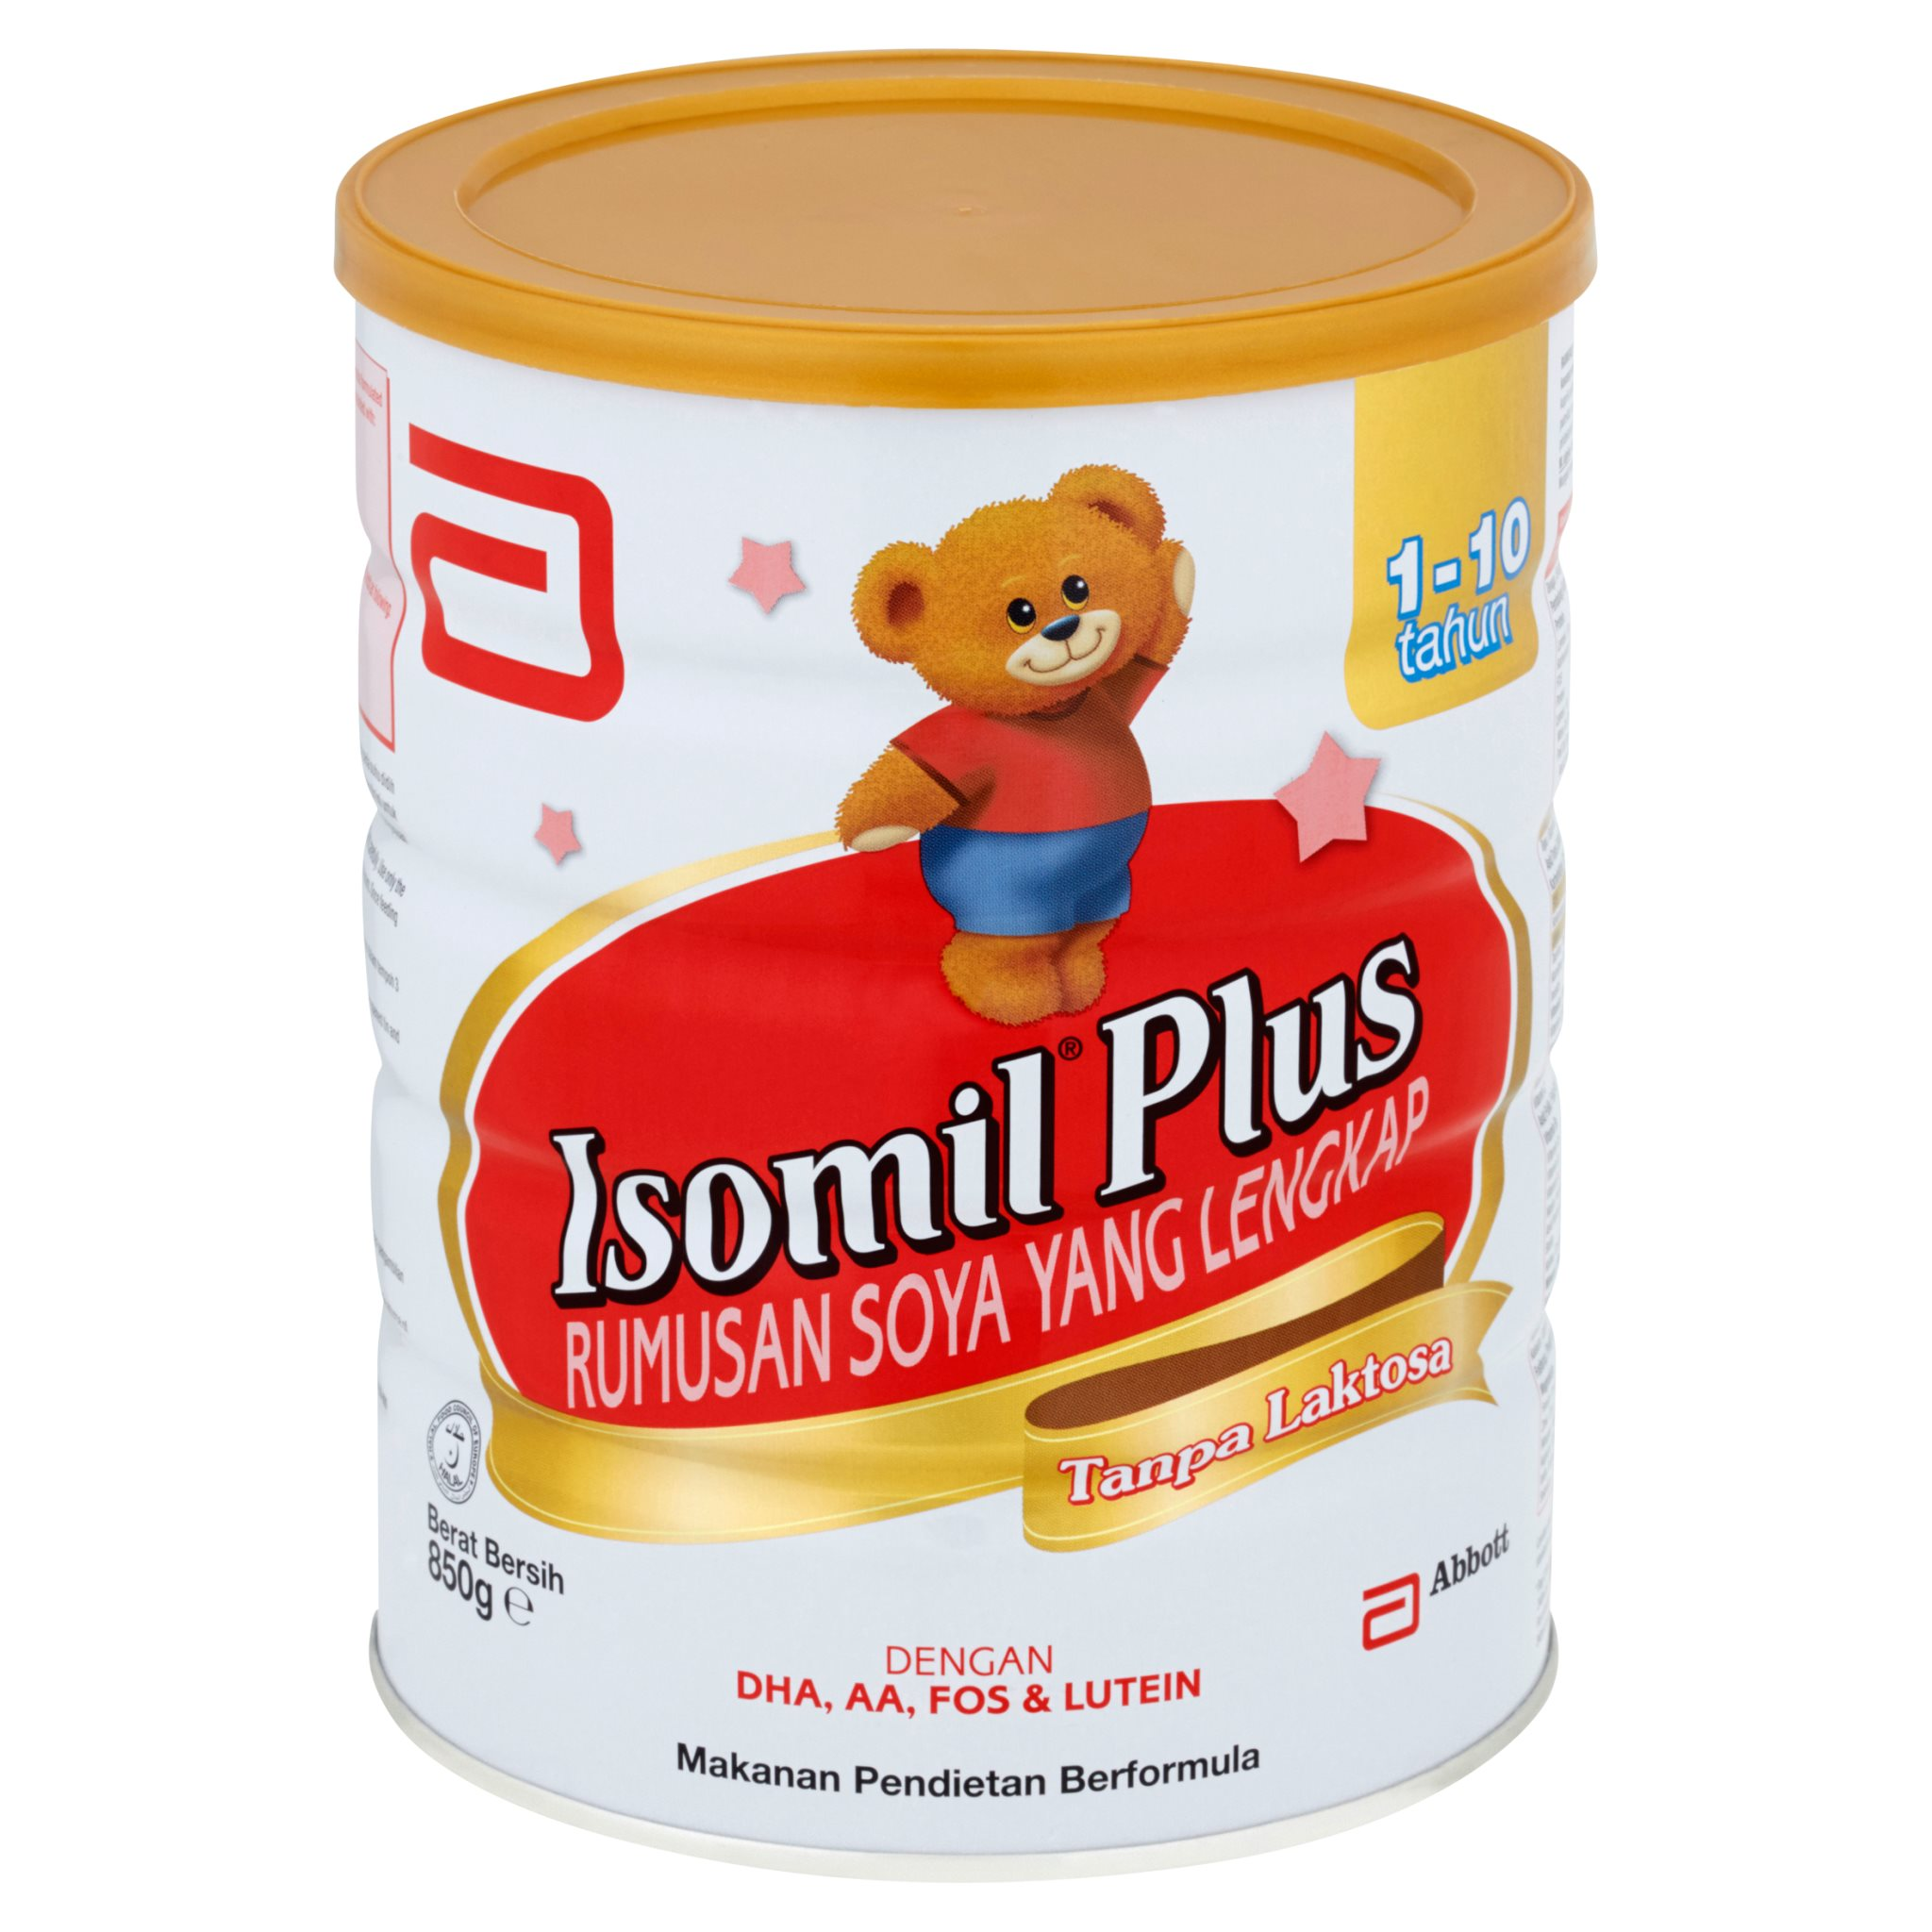 Isomil Plus 1 – 10 Years Old Milk Powder (850g)